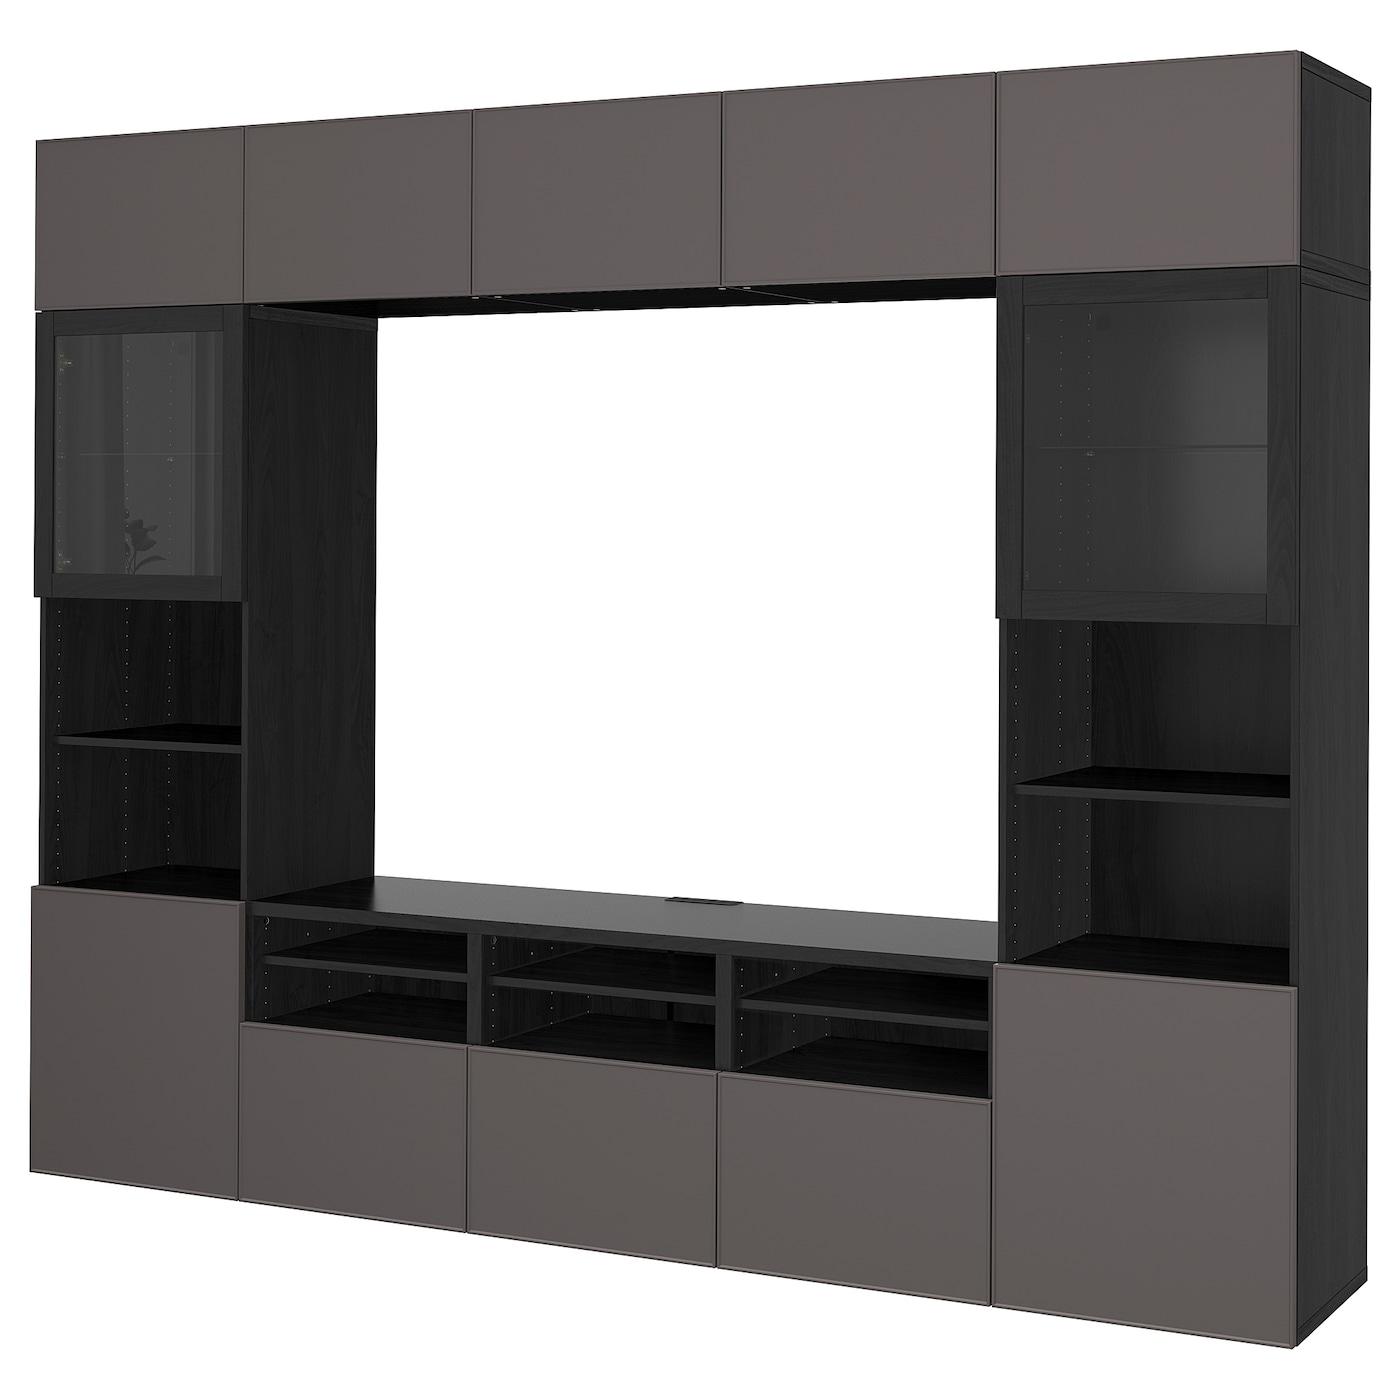 Best mueble tv con almacenaje negro marr n grundsviken gris oscuro vidrio incoloro 300 x 40 x - Muebles almacenaje ikea ...